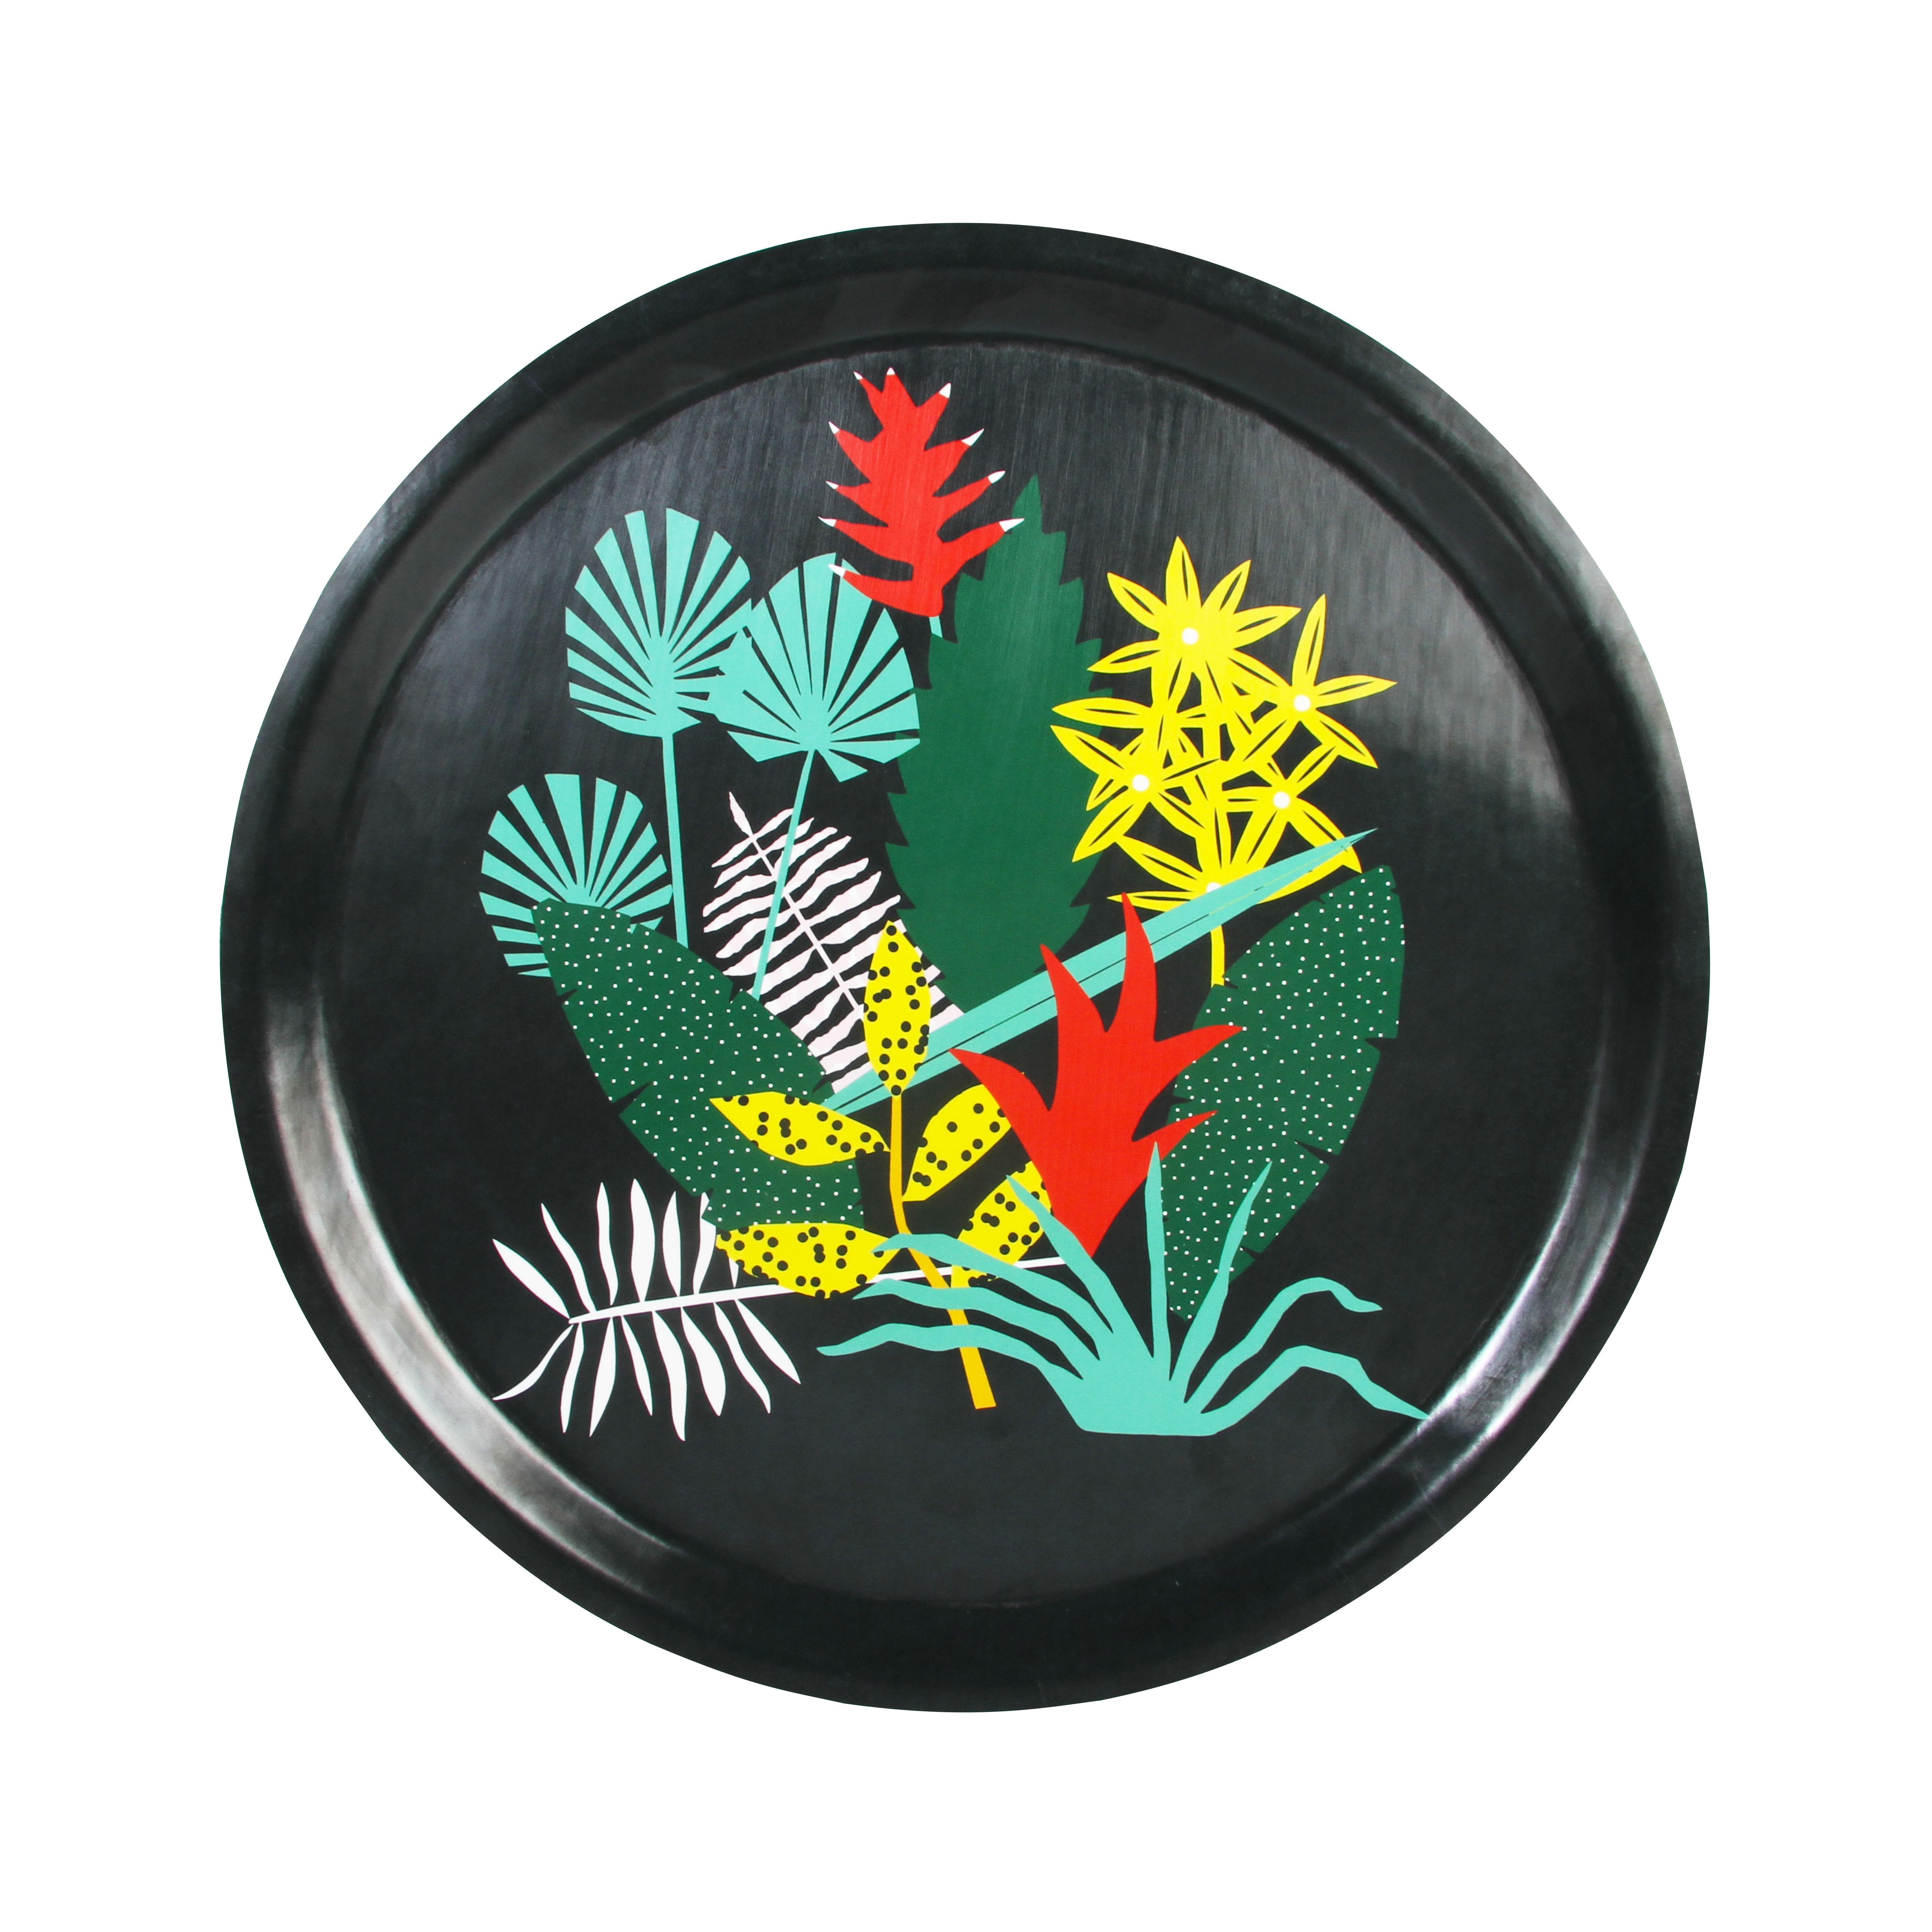 Tableware - Trays - Botanic Tray - Ø 31 cm by & klevering - Botanic / Black - Melamine, Plywood